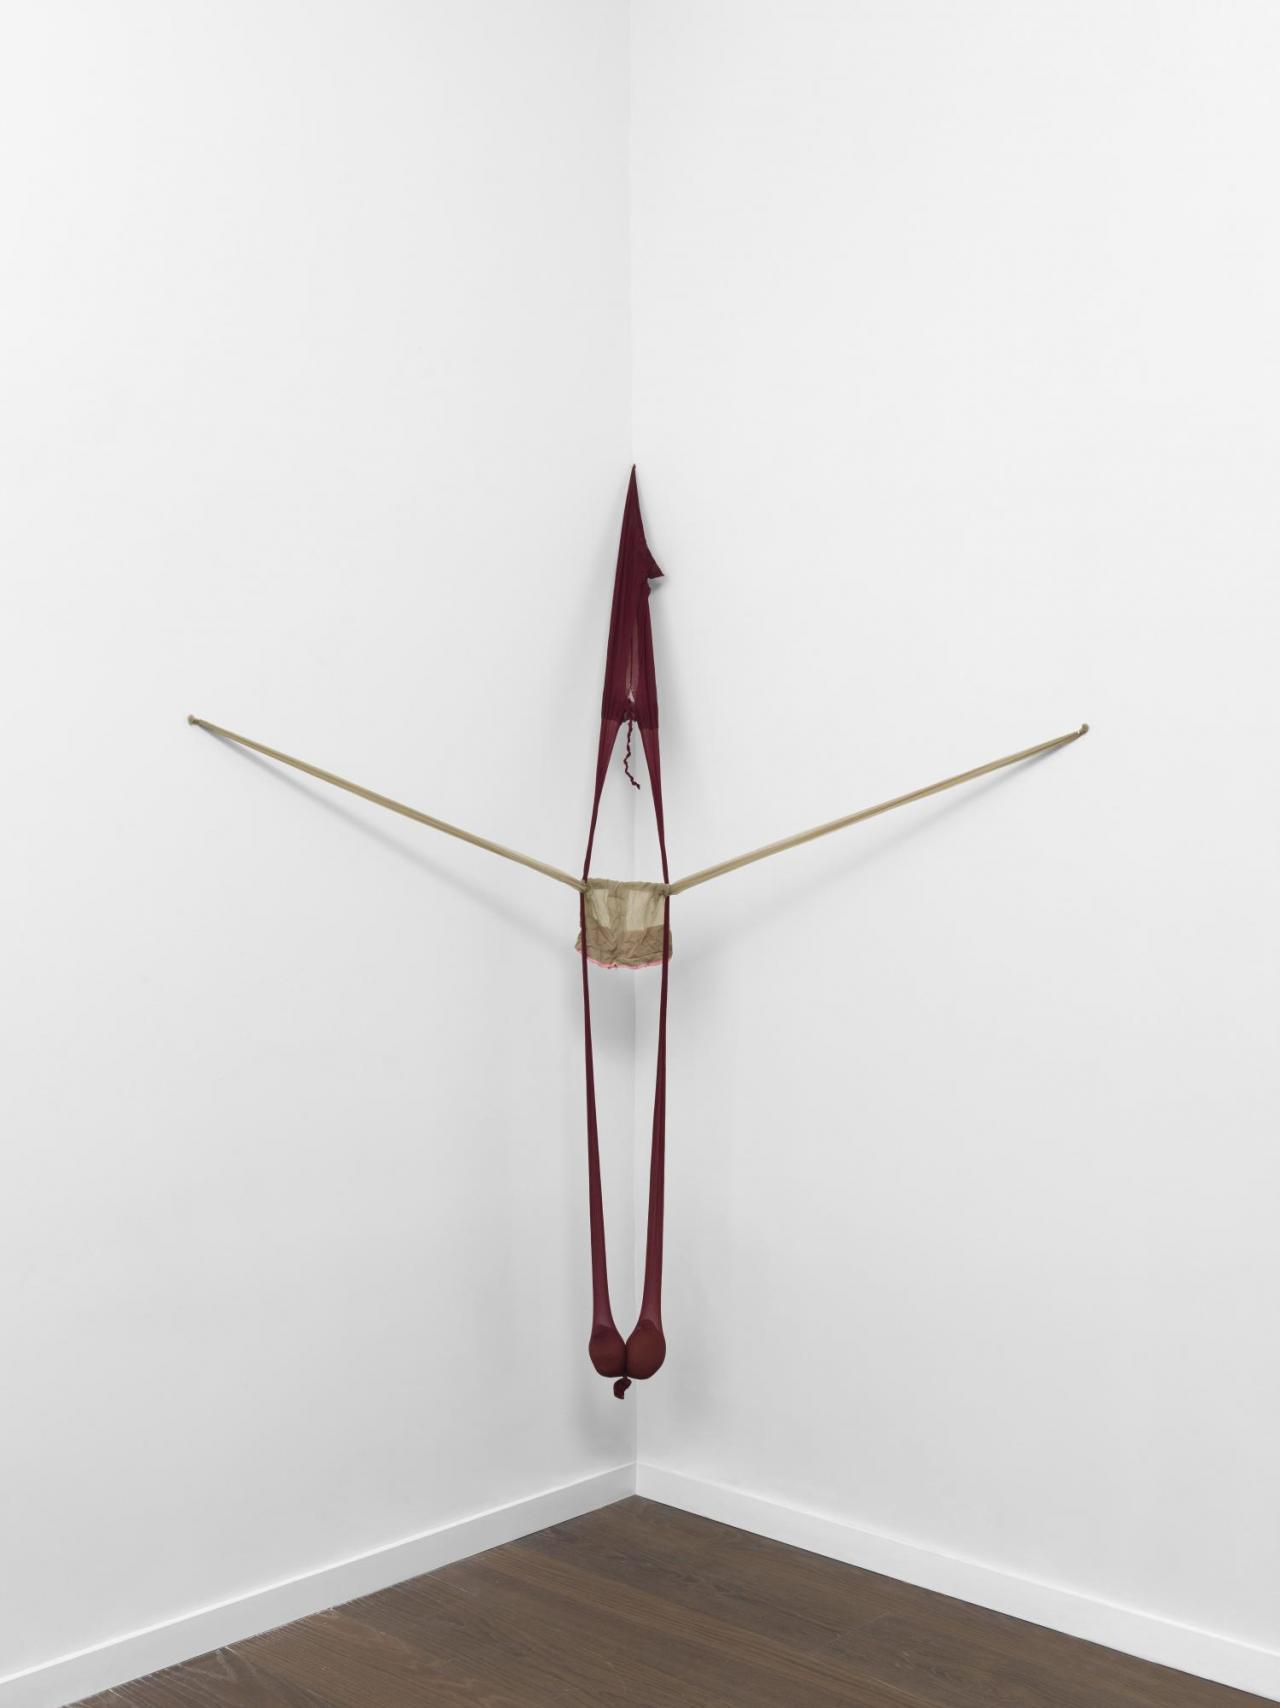 Senga Nengudi, R.S.V.P ., 2004 Nylon, Sand Courtesy the artist, Thomas Erben Gallery, and Lévy Gorvy, New York